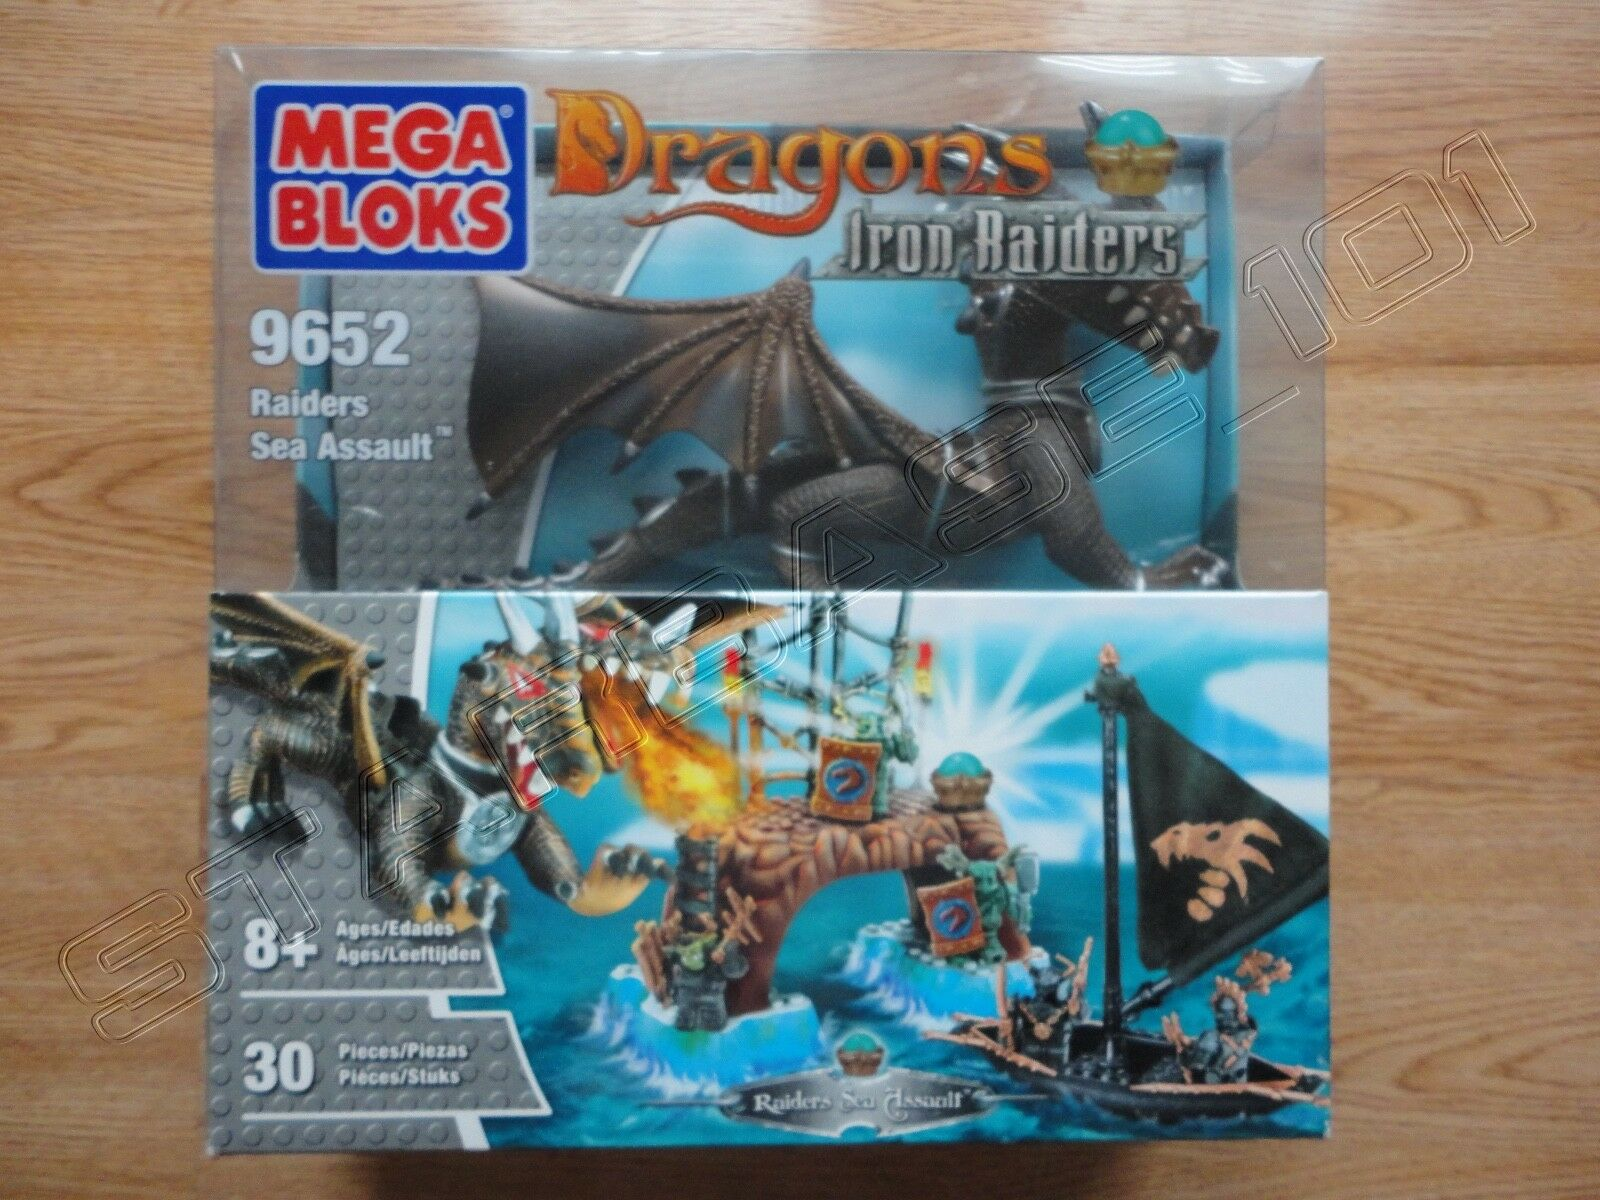 Seltene mega - bloks drachen eisen piraten piraten meer angriff   9652 - neu   versiegelt